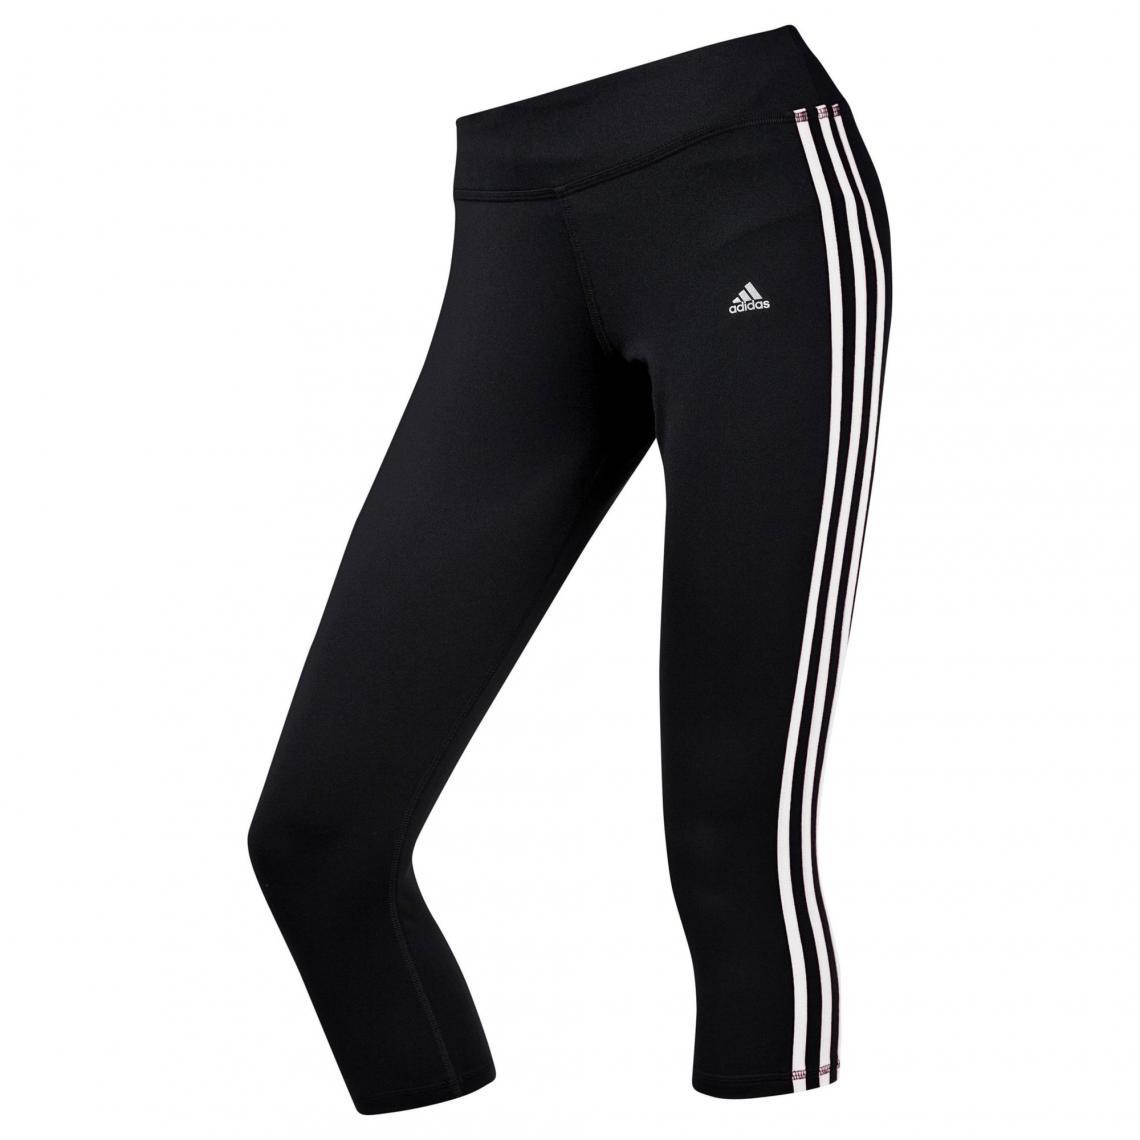 Pantalon legging 34 sport femme Climalite adidas - Noir Adidas Performance bfa49b465f3